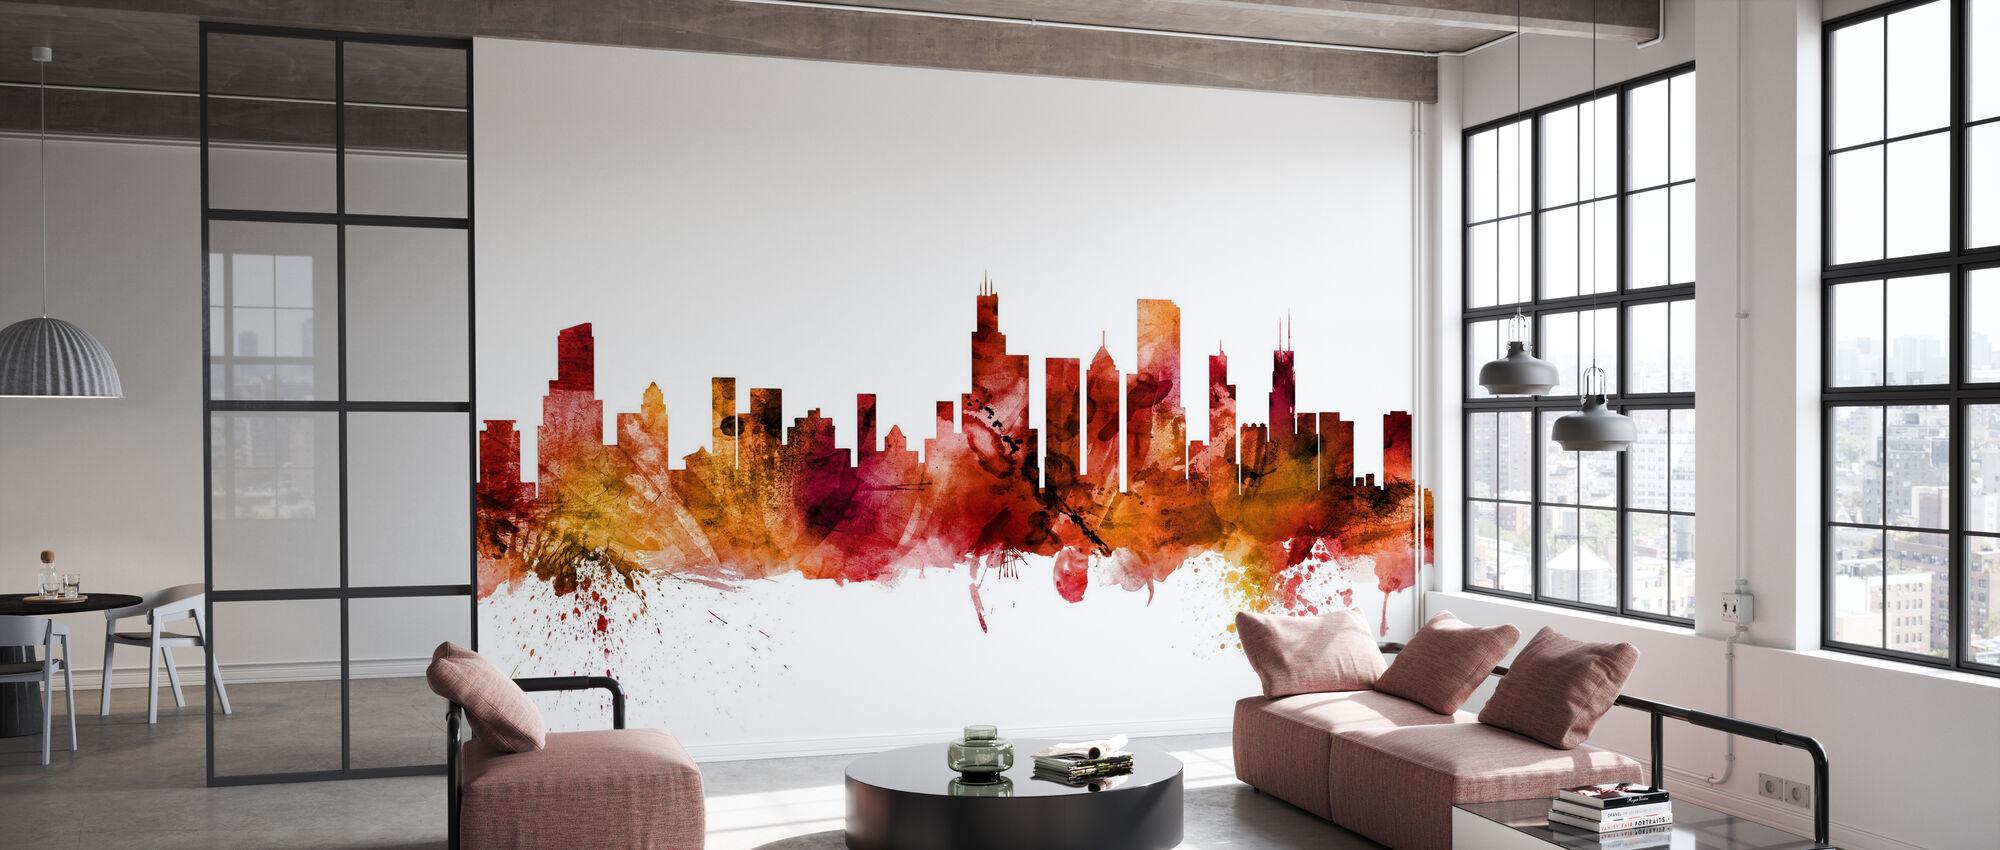 Chicago Illinois Skyline - Papier peint - Bureau